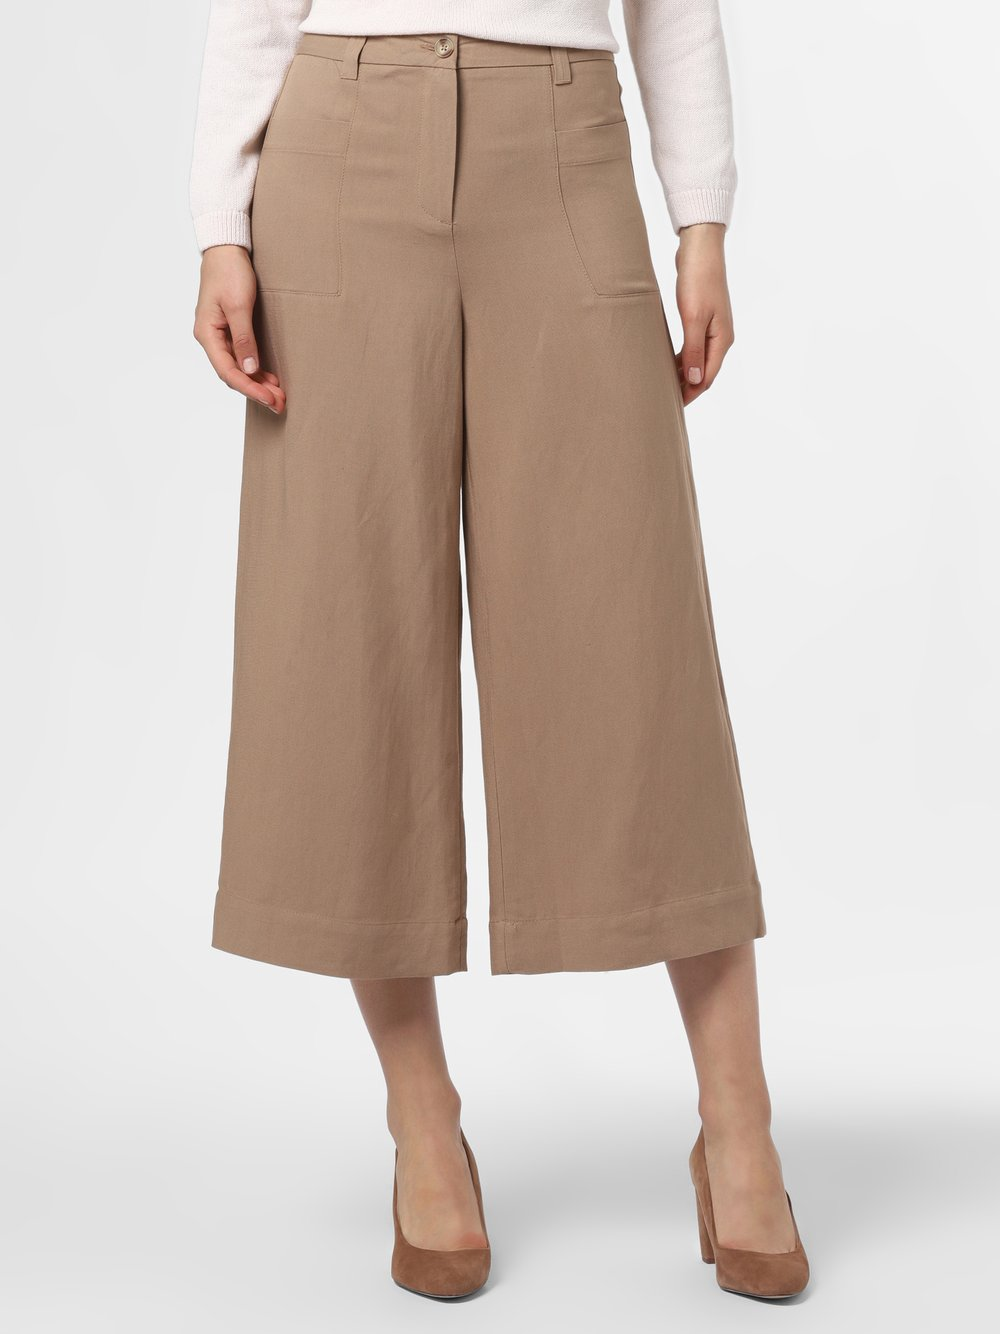 More & More - Spodnie damskie z dodatkiem lnu, beżowy